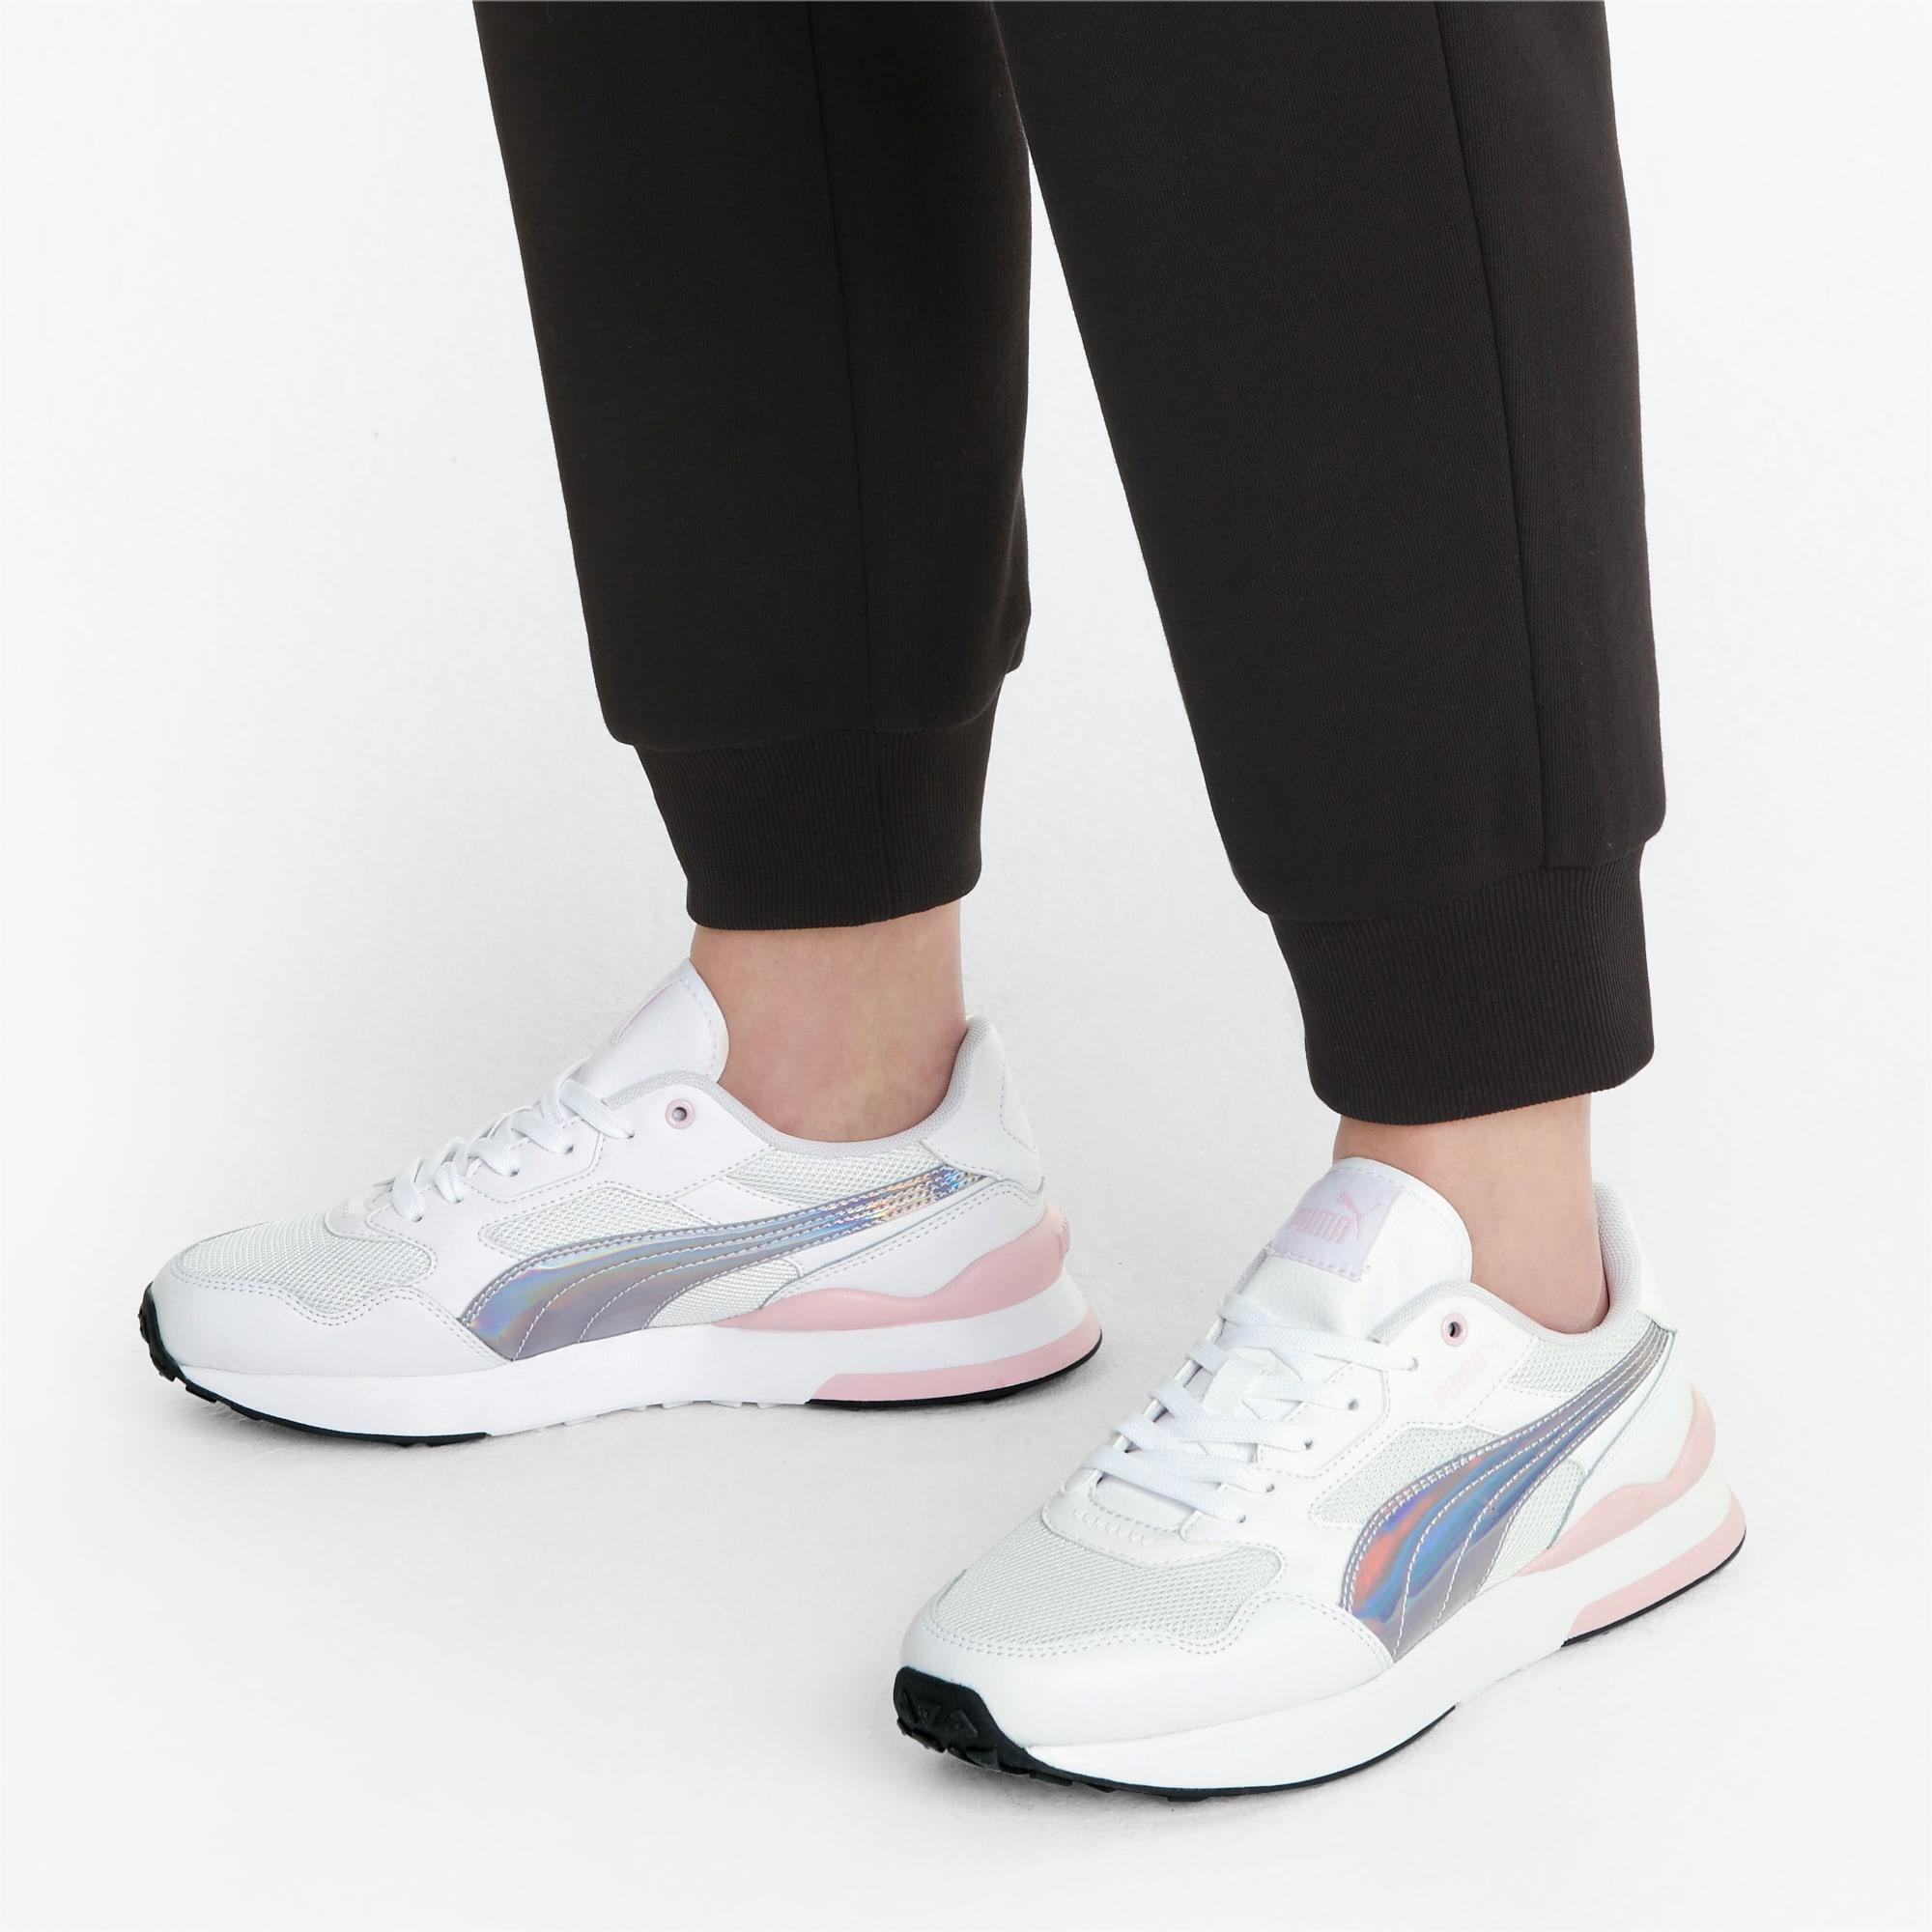 R78 FUTR Iridescent Women's Sneakers | PUMA US